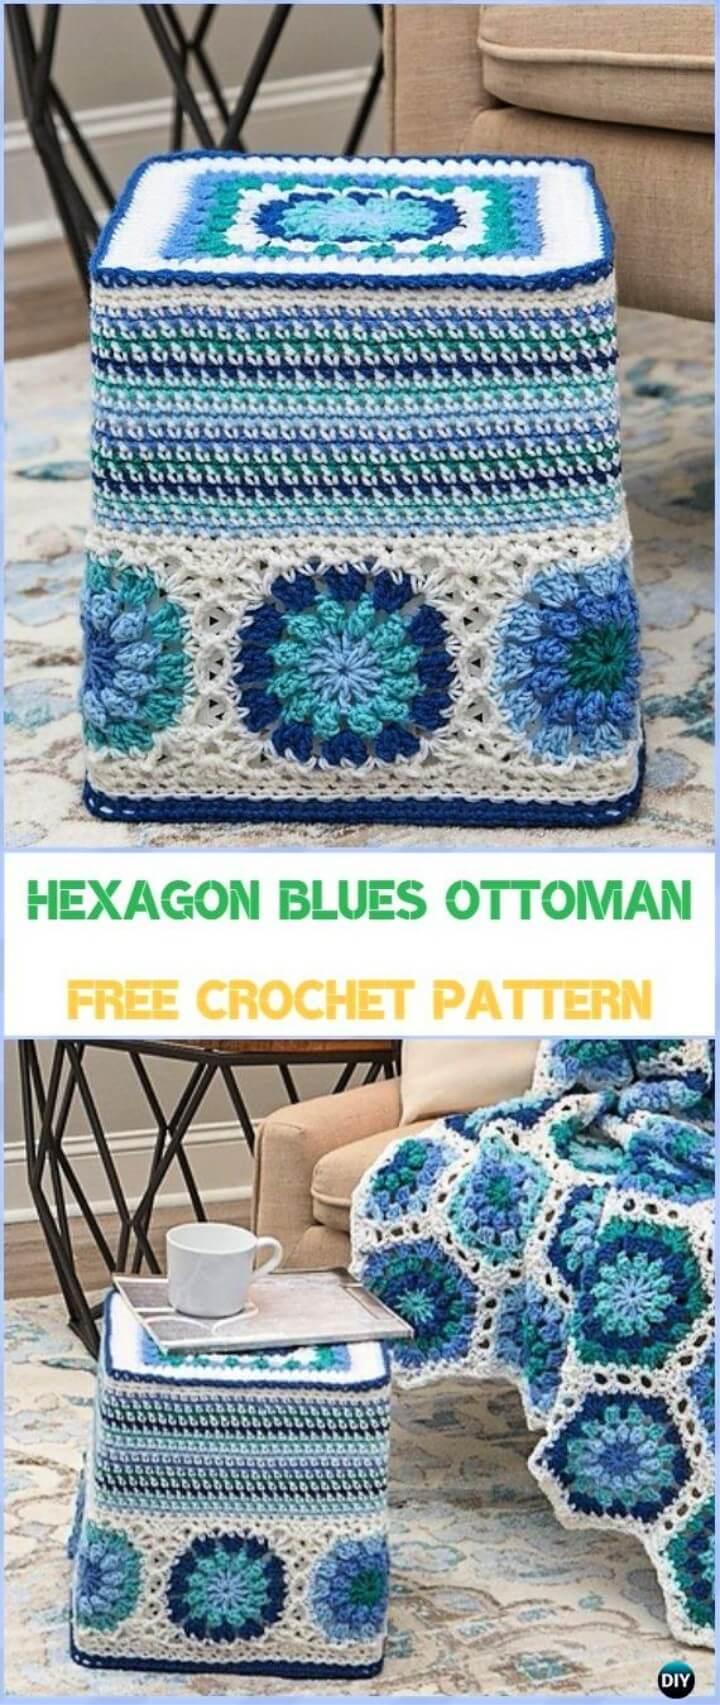 Hexagon Blues Ottoman